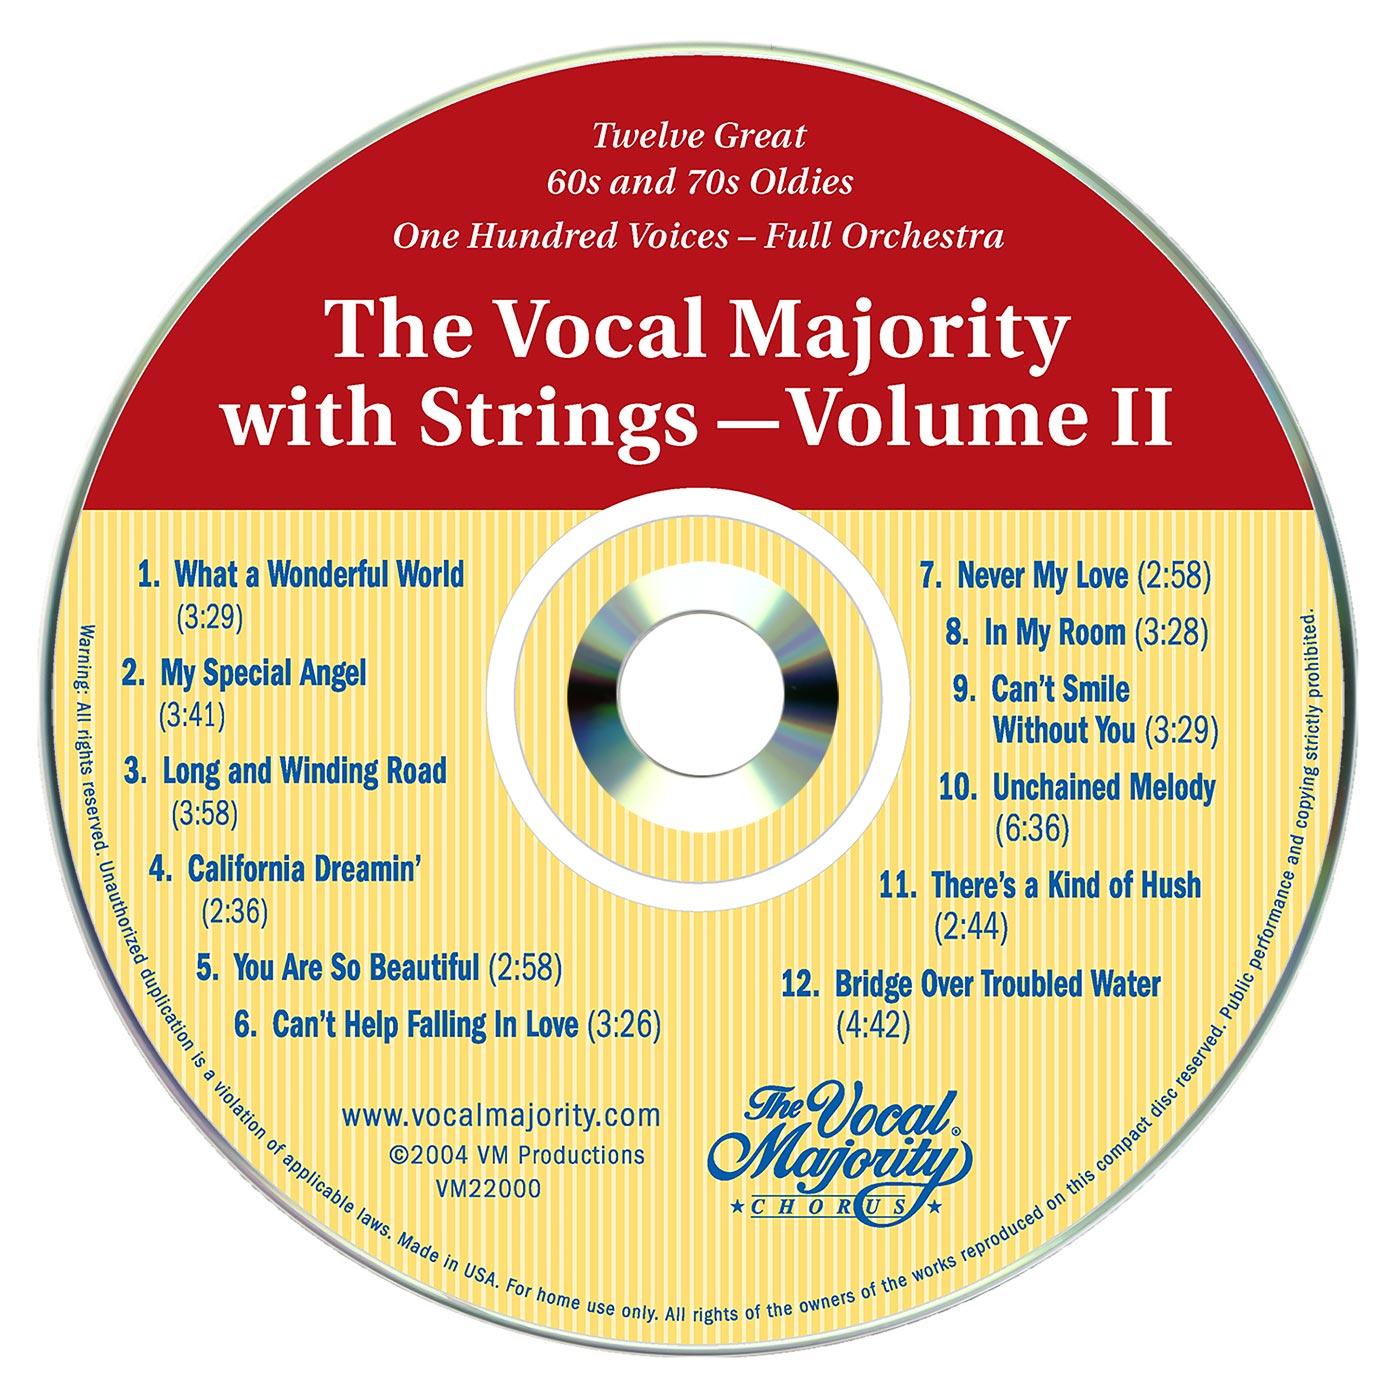 Disc Art: VM With Strings Vol. 2